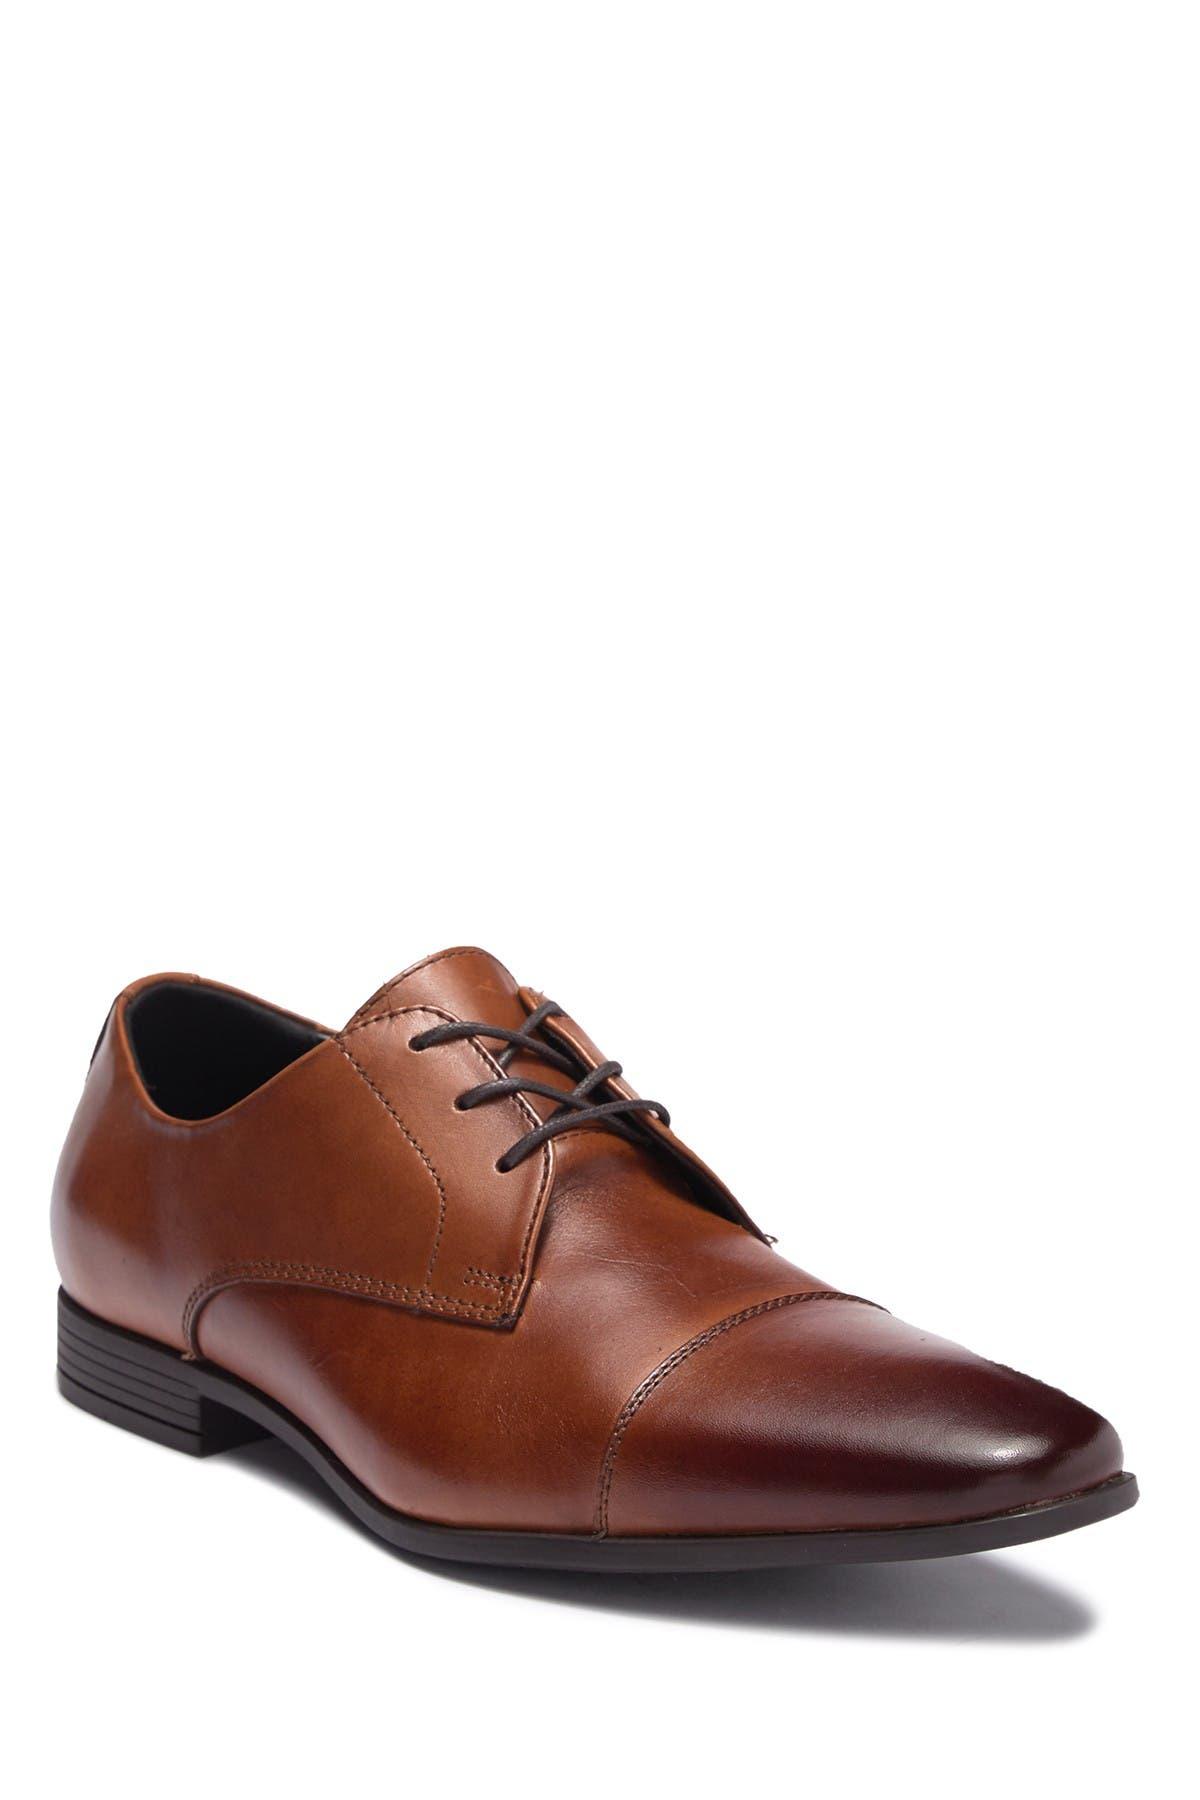 Shoes for Men Clearance | Nordstrom Rack